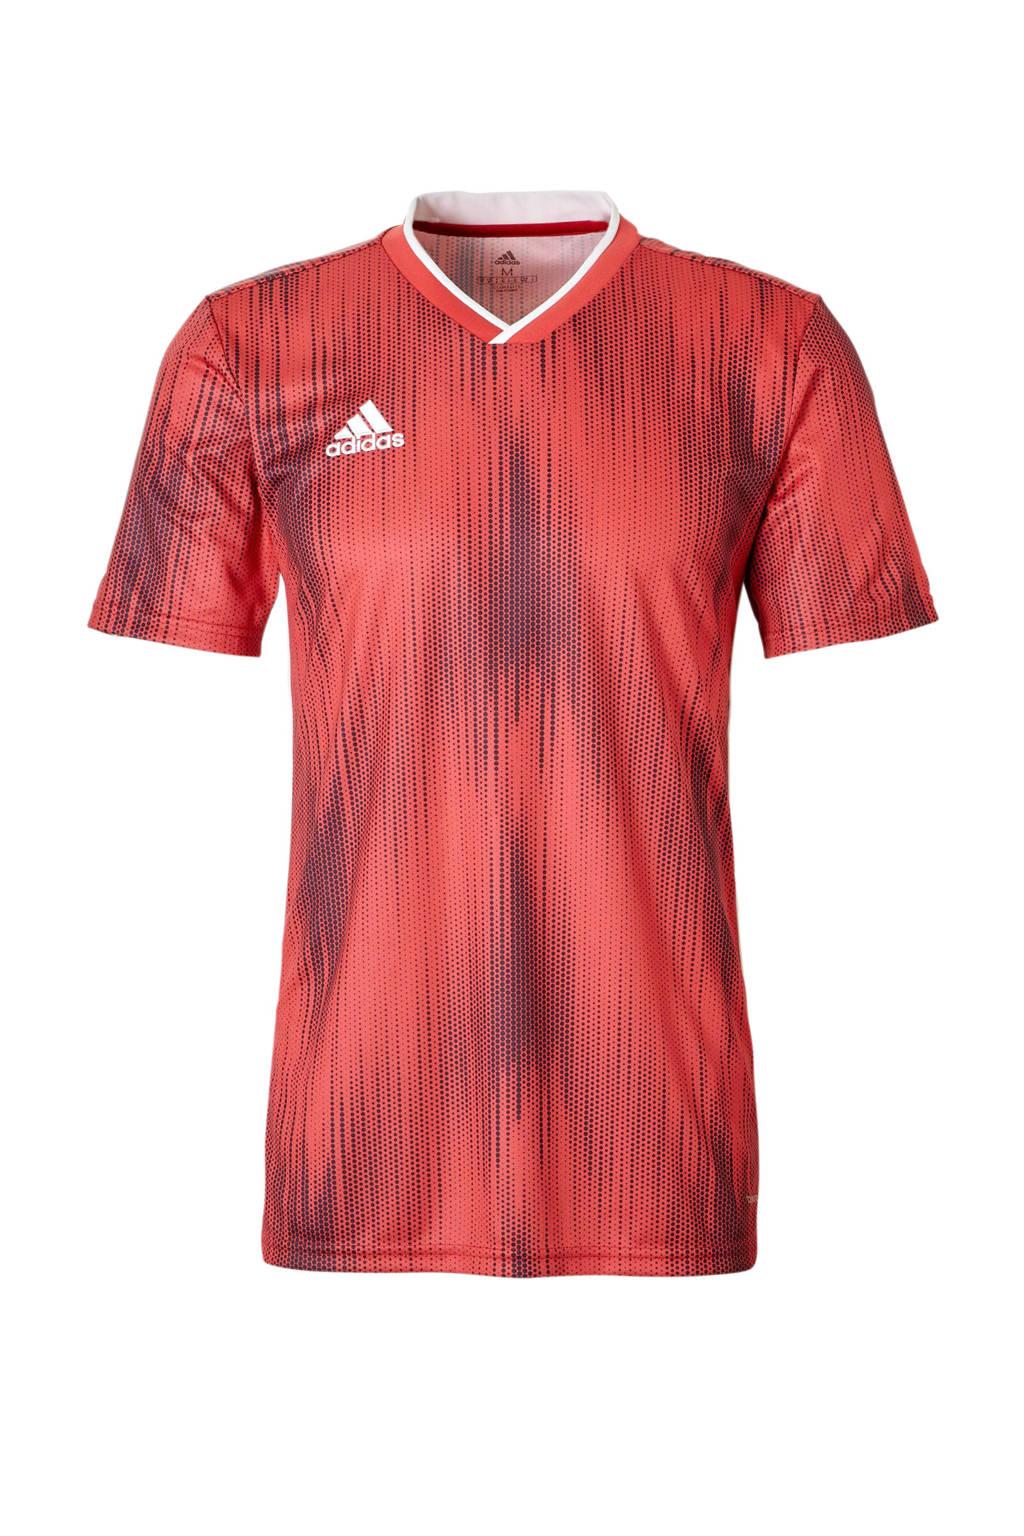 adidas performance Senior  sport T-shirt Tiro rood, Heren